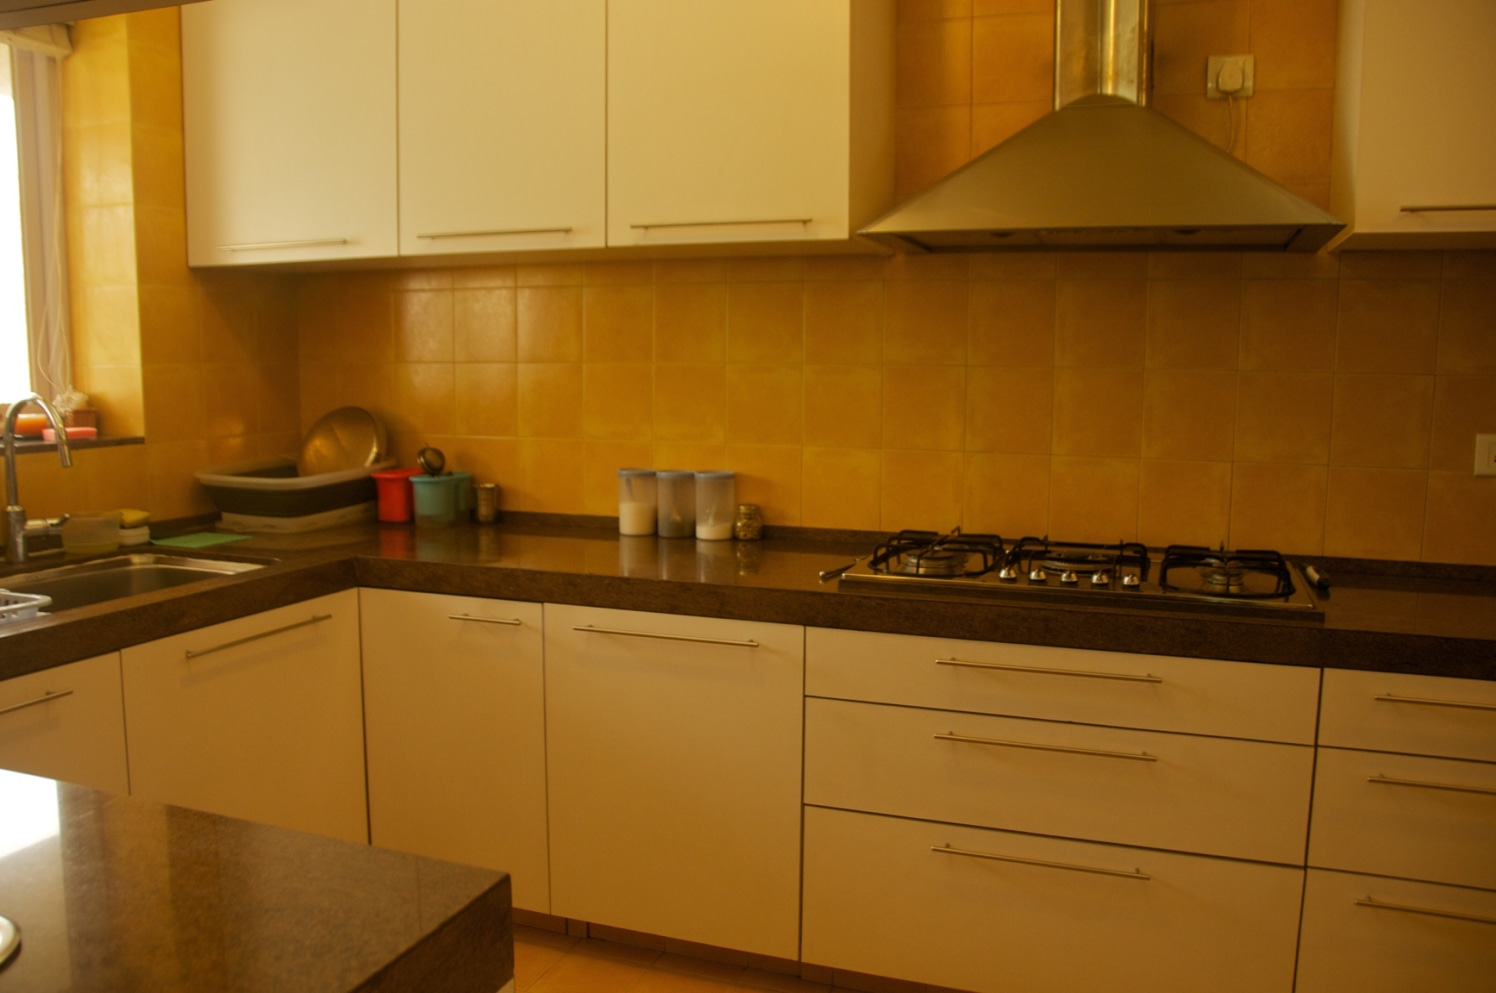 Modular Kitchen With White Glossy Cabinets and Black Counter Top by Viraf Laskari  Modular-kitchen Modern | Interior Design Photos & Ideas